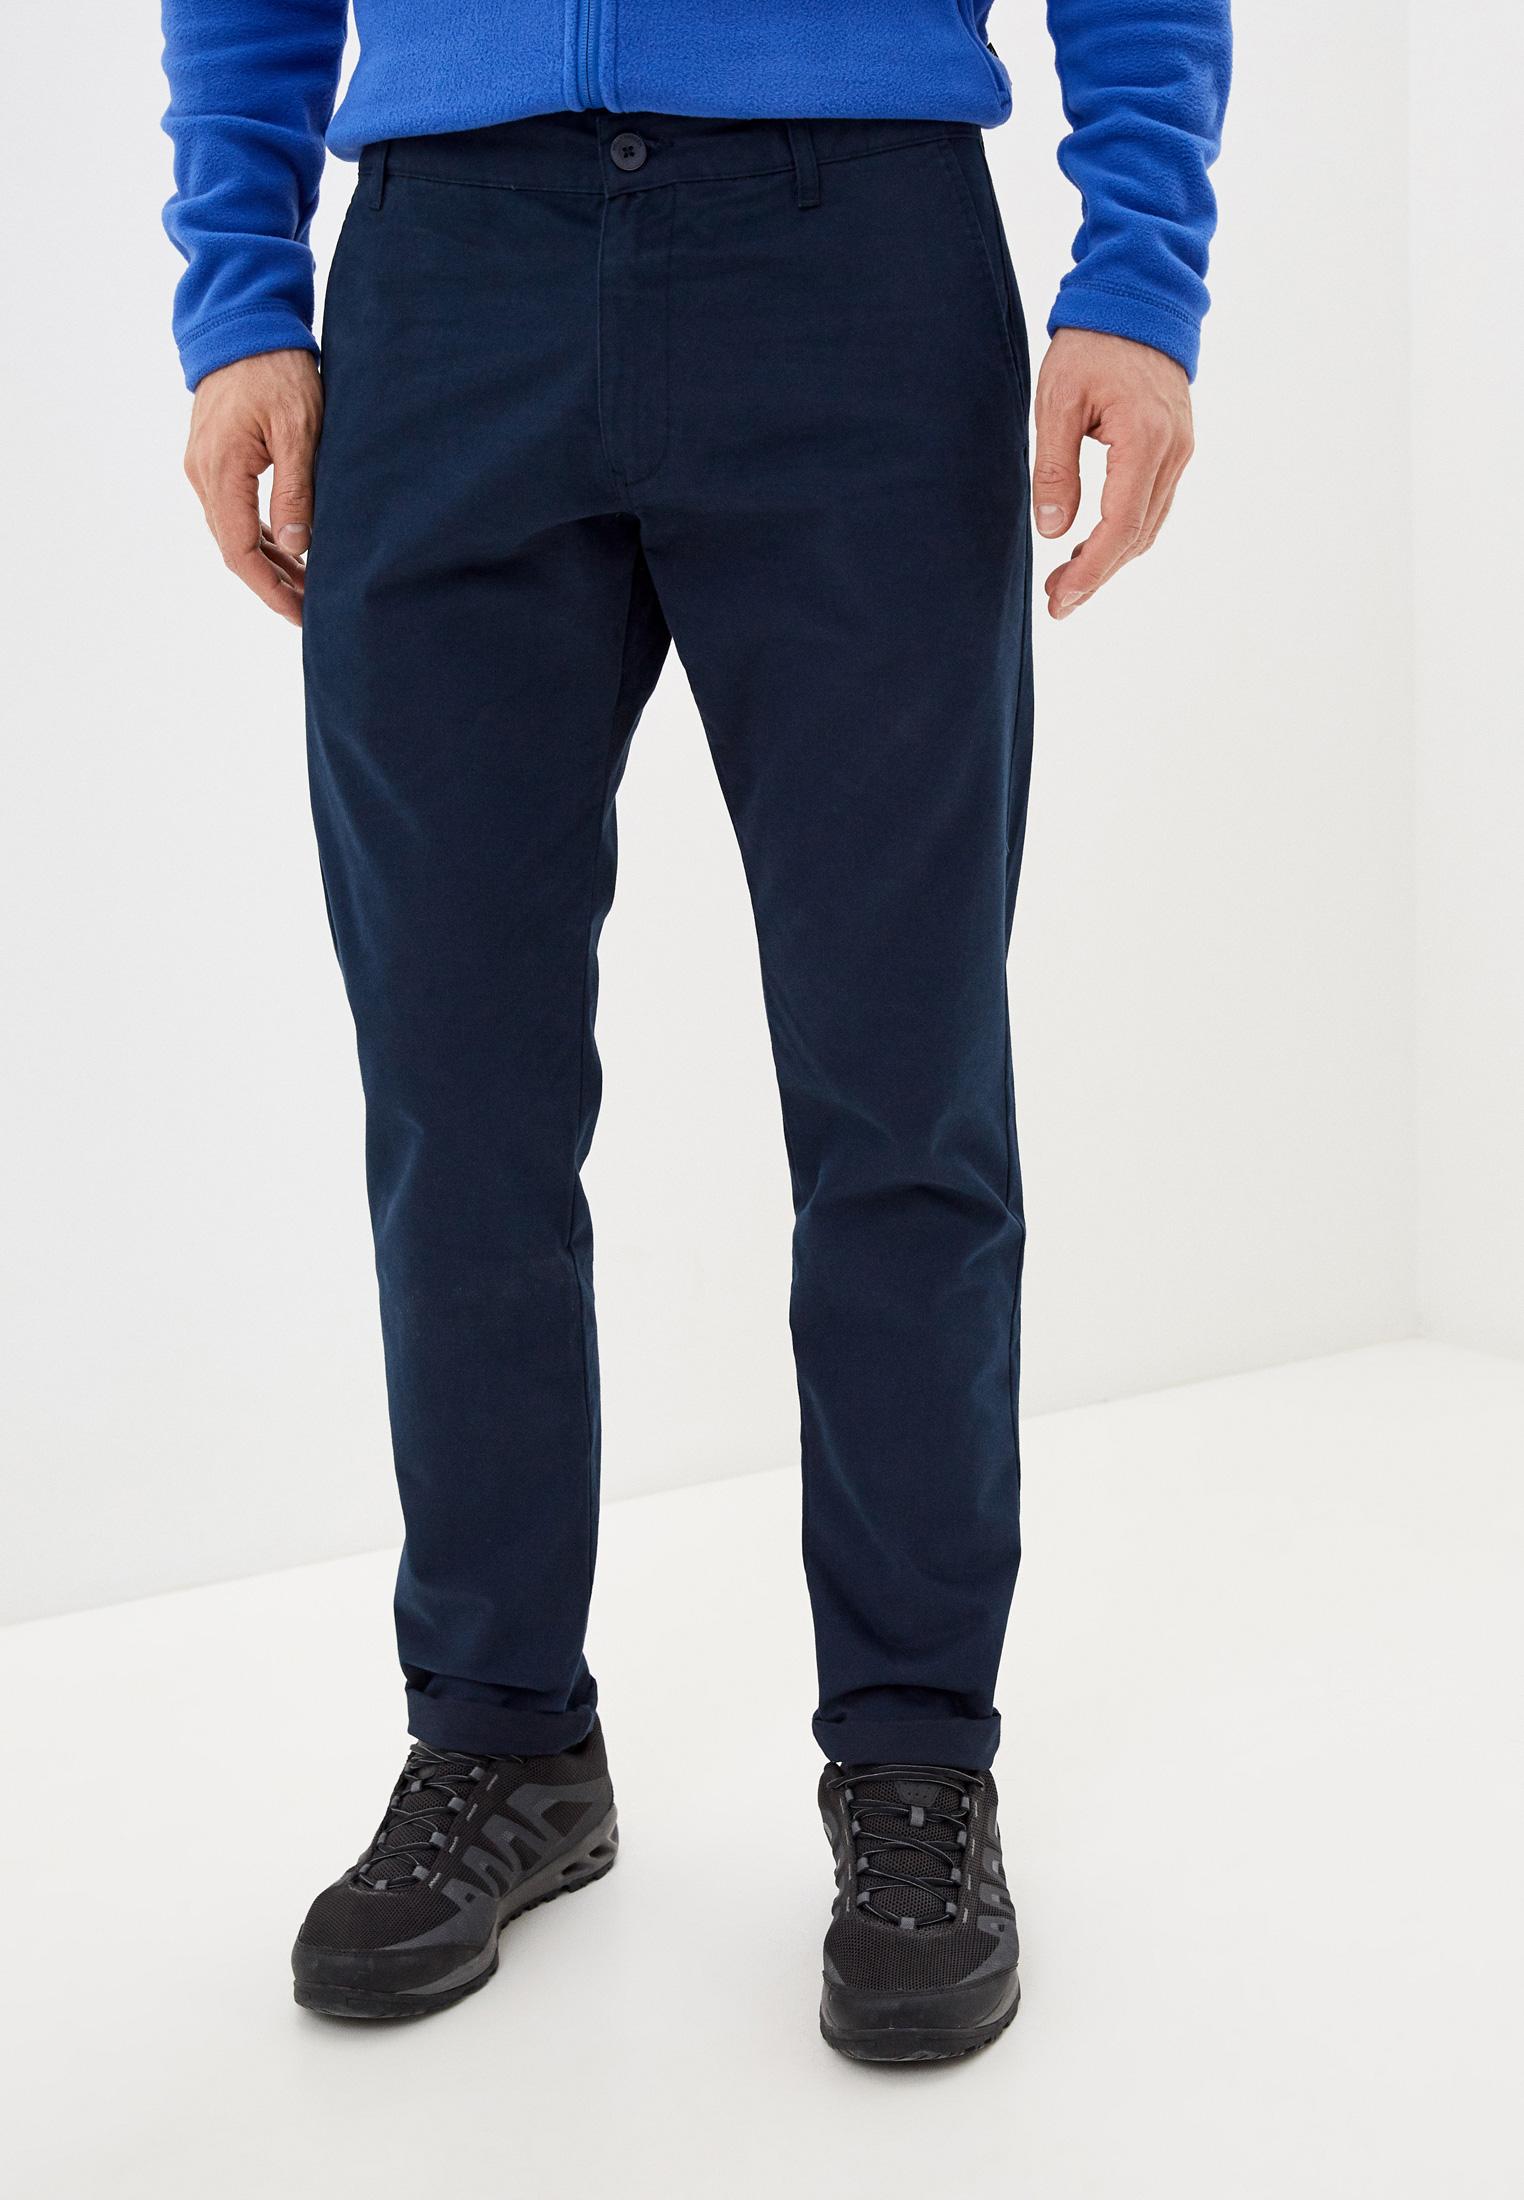 Мужские брюки Helly Hansen (Хелли Хансен) 34126